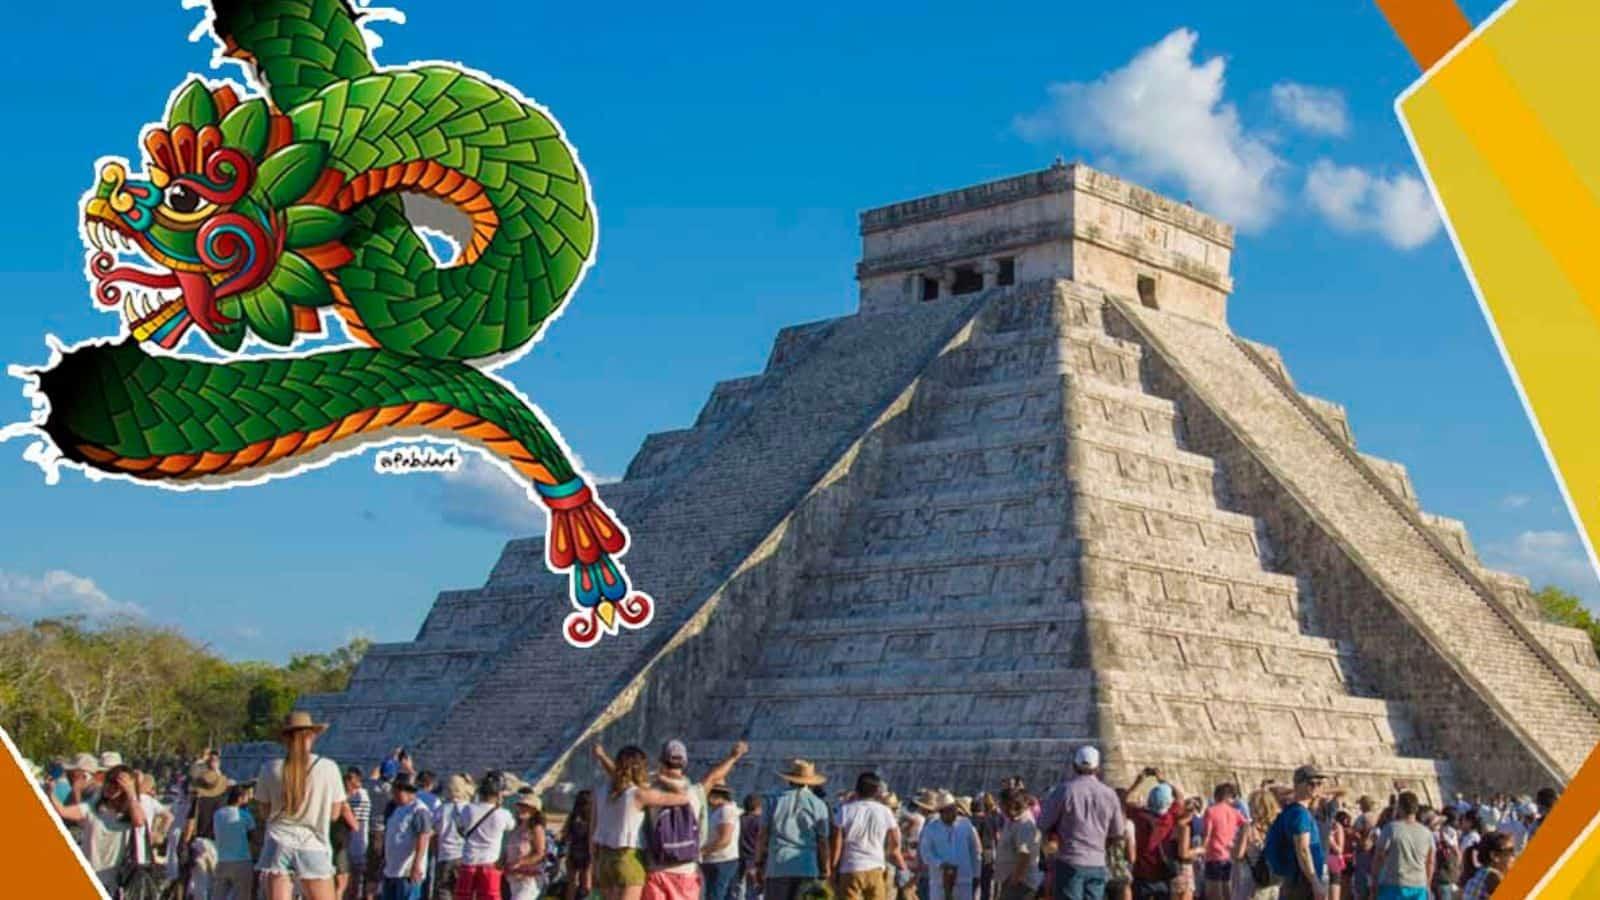 Tour Chichen Itzá Equinoccio 2021 (21 de Marzo) desde Cancún Cancún